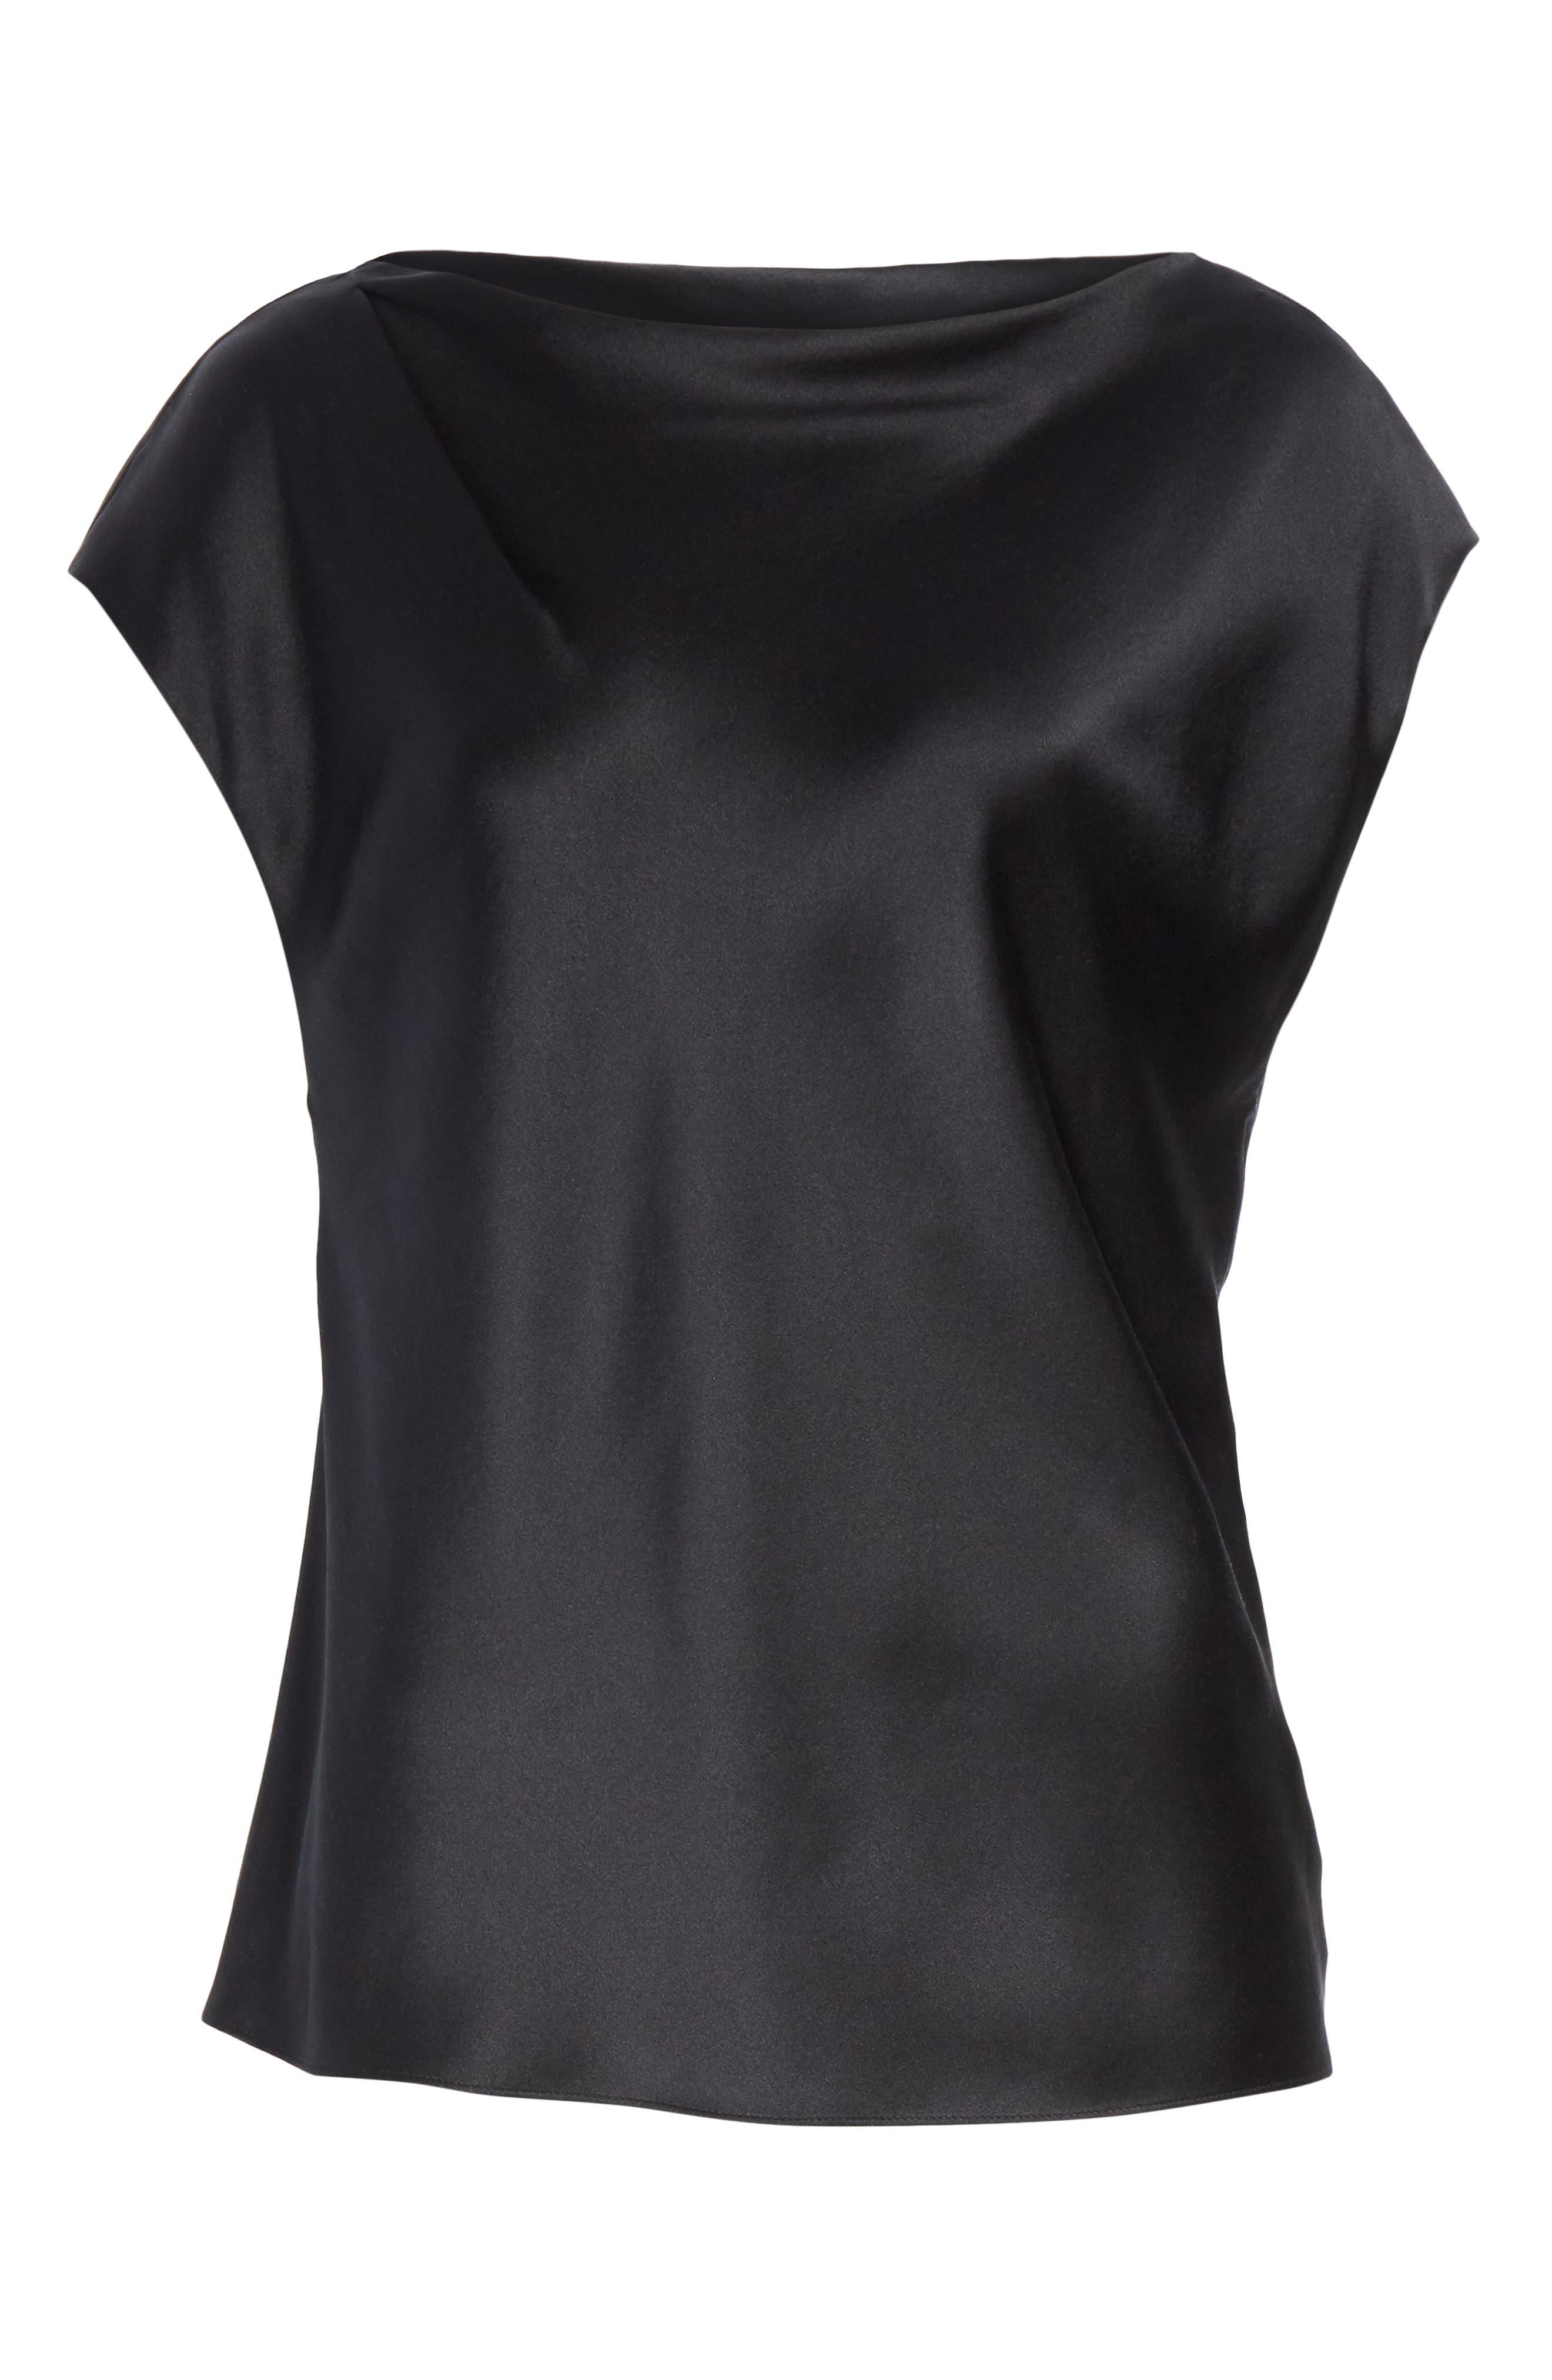 Silk Off the Shoulder Blouse,                             Alternate thumbnail 6, color,                             001